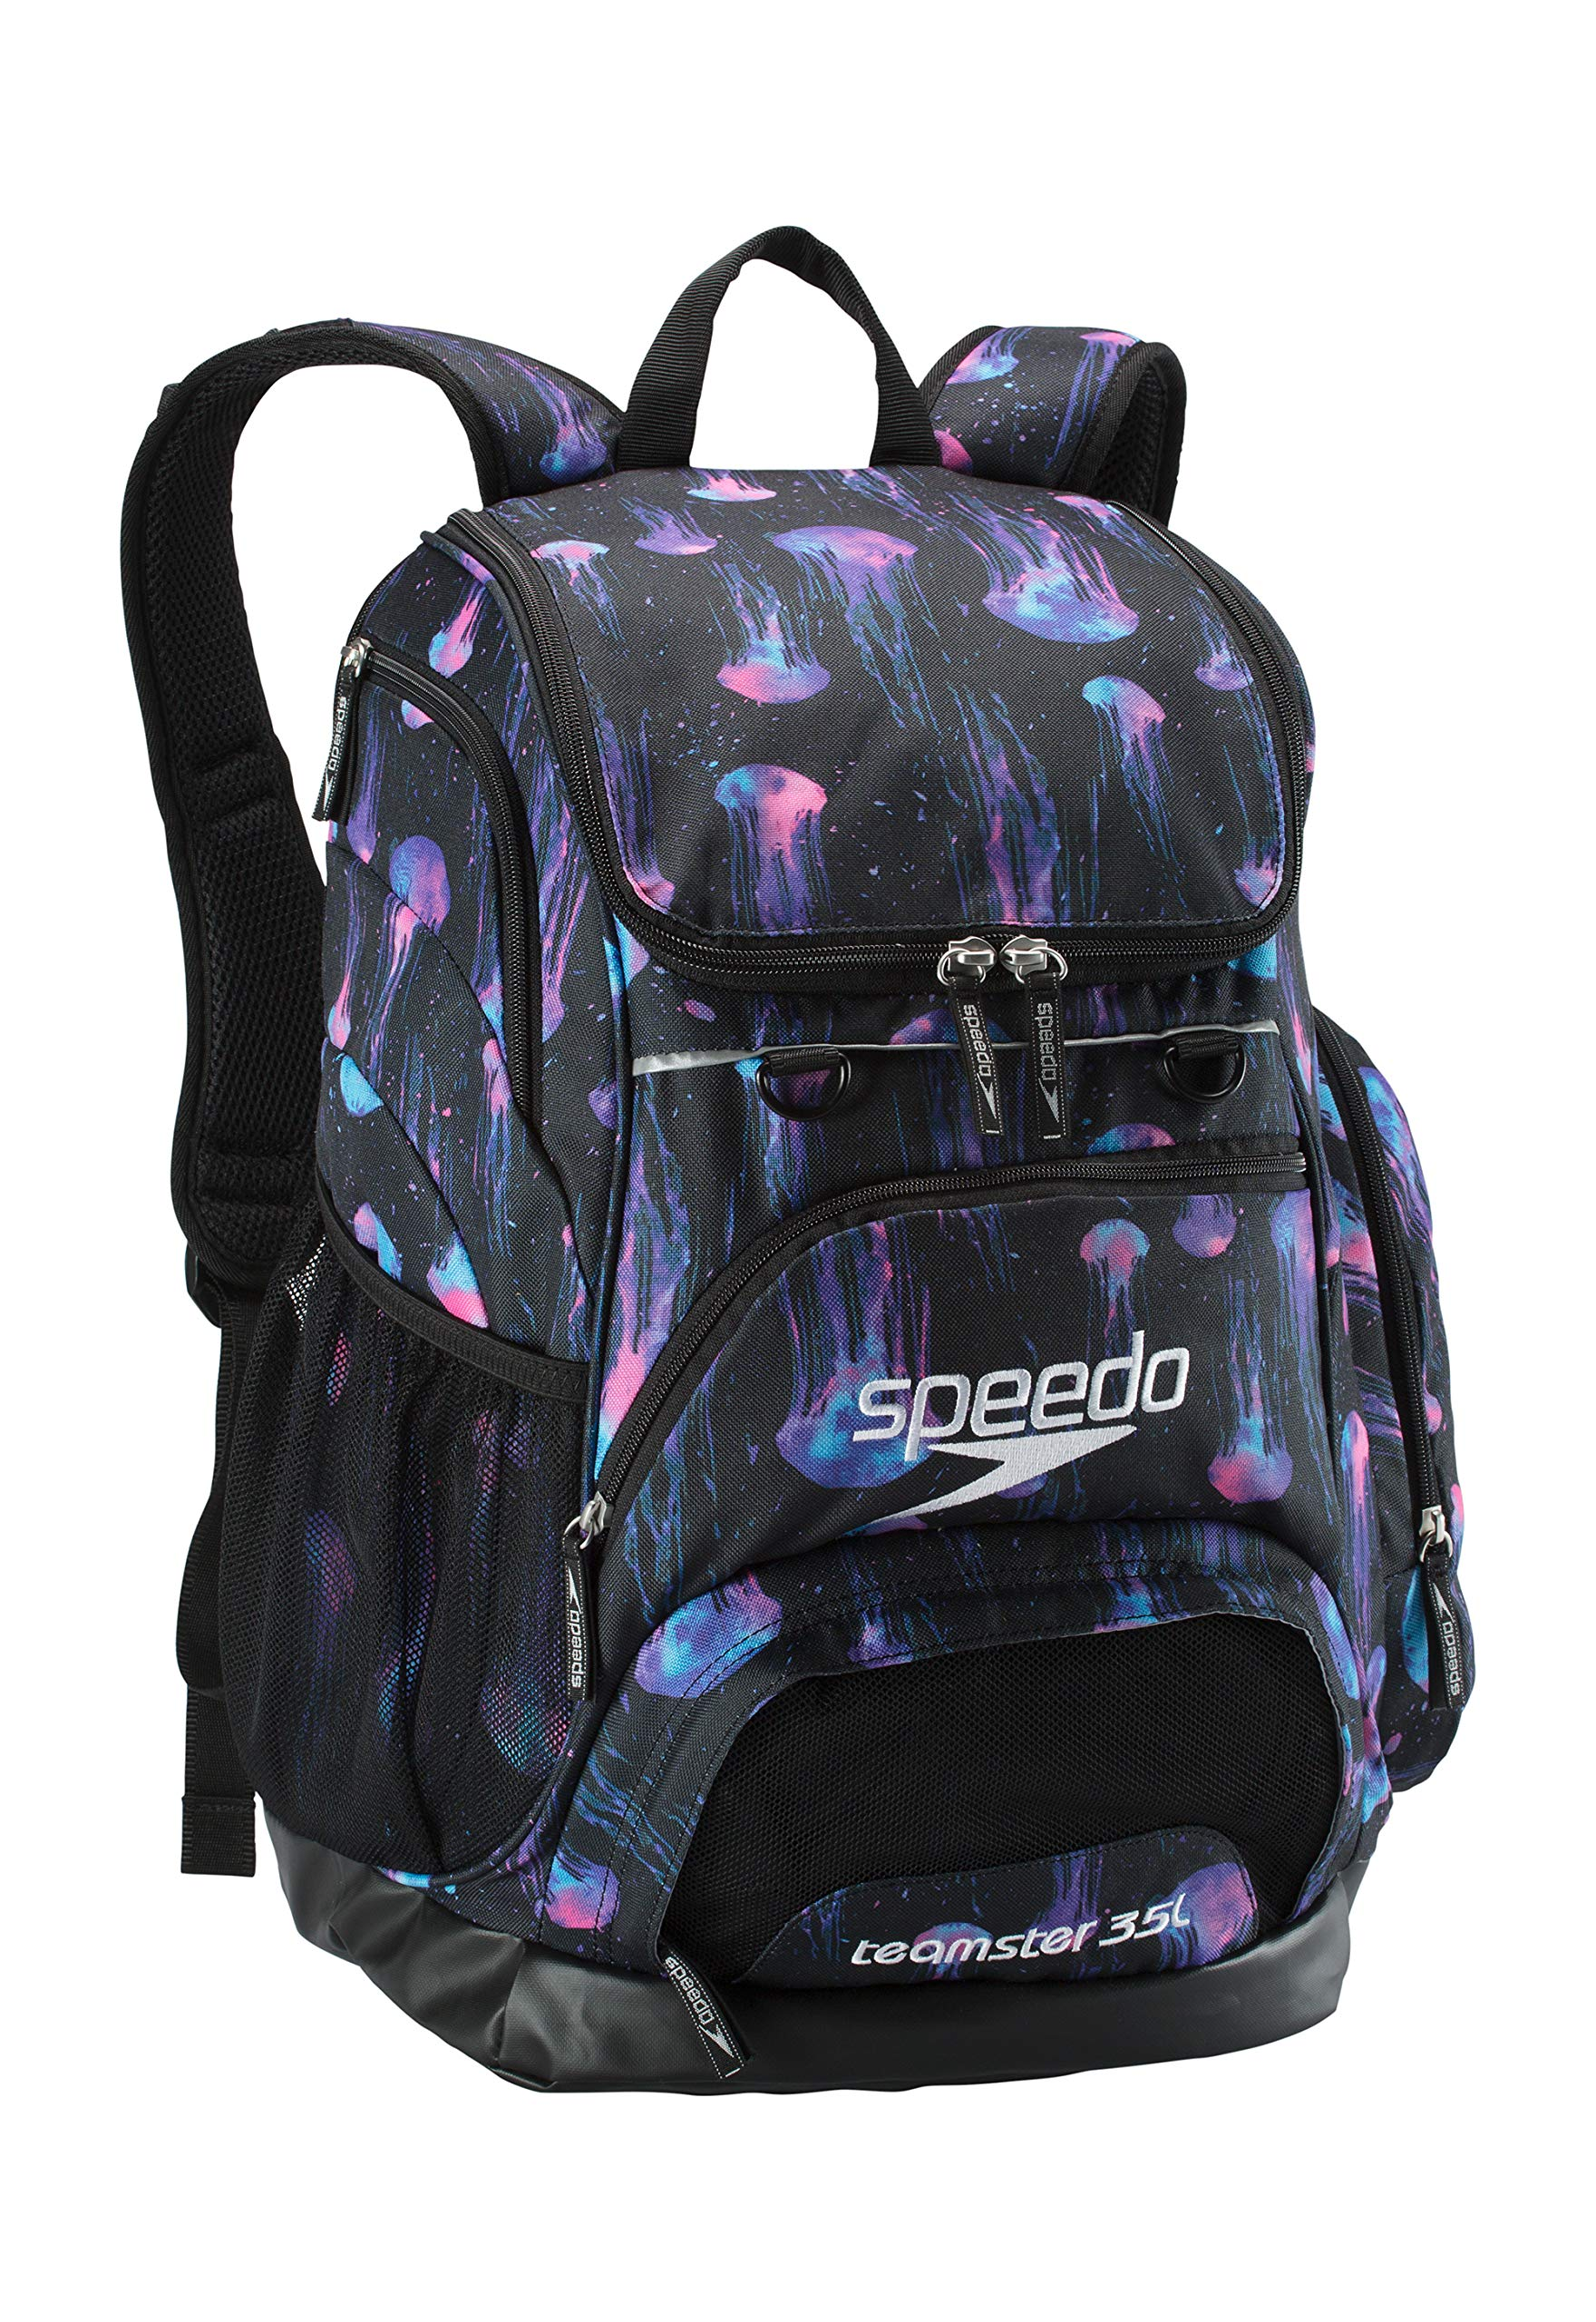 Speedo Printed Teamster Backpack 35L, Black/Blue, One Size